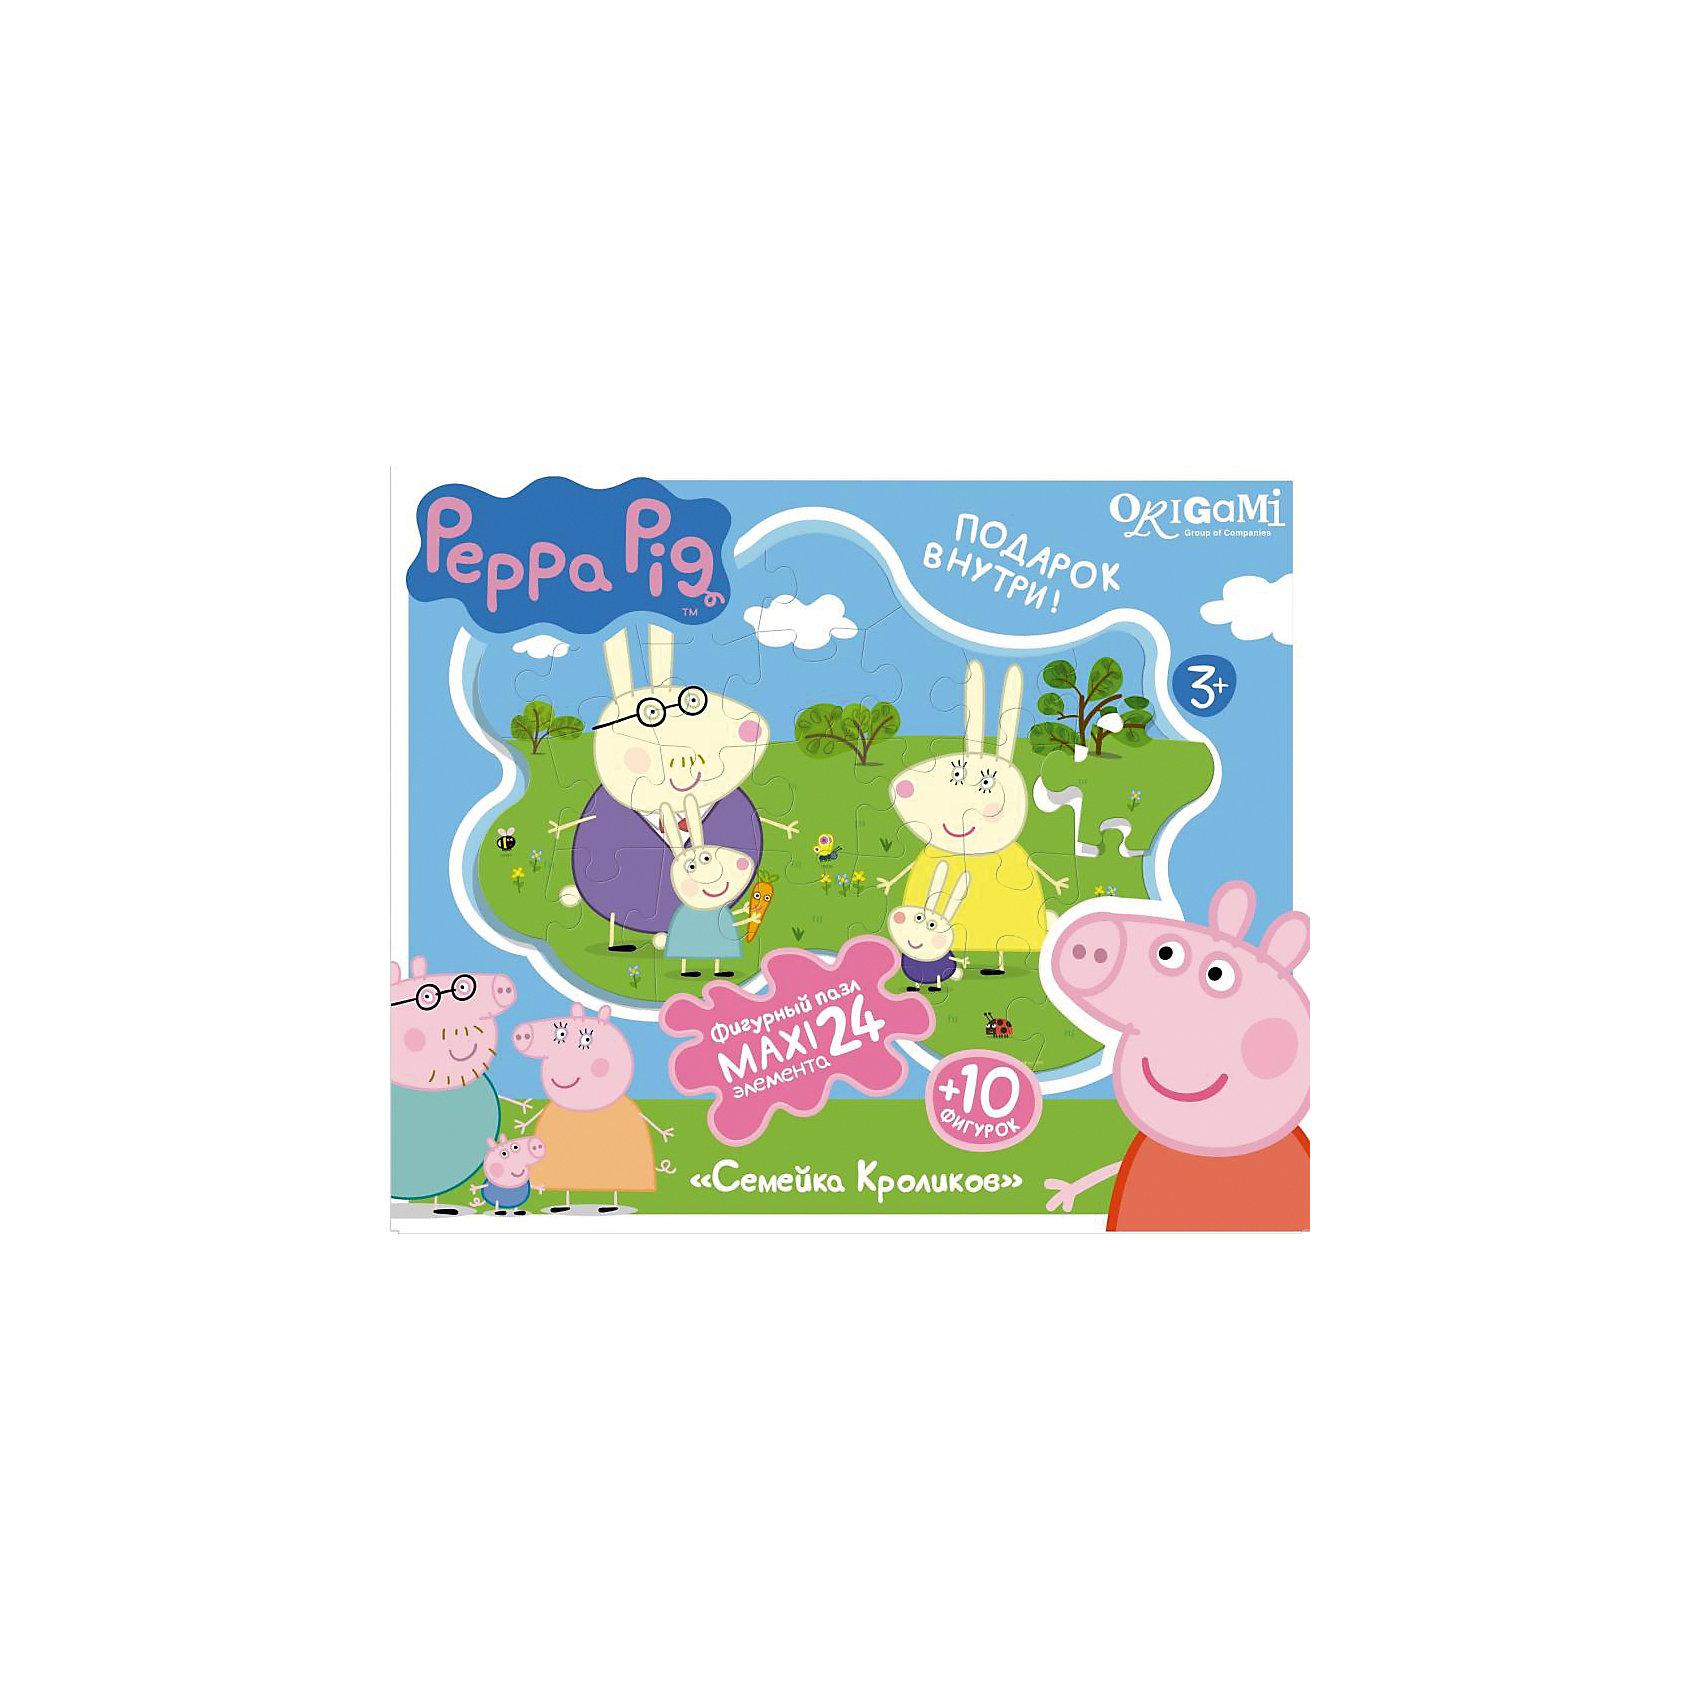 Origami Пазл Семья кроликов + магниты + подставки, 24 MAXI детали, Свинка Пеппа пазл origami 01569 peppa pig 24эл